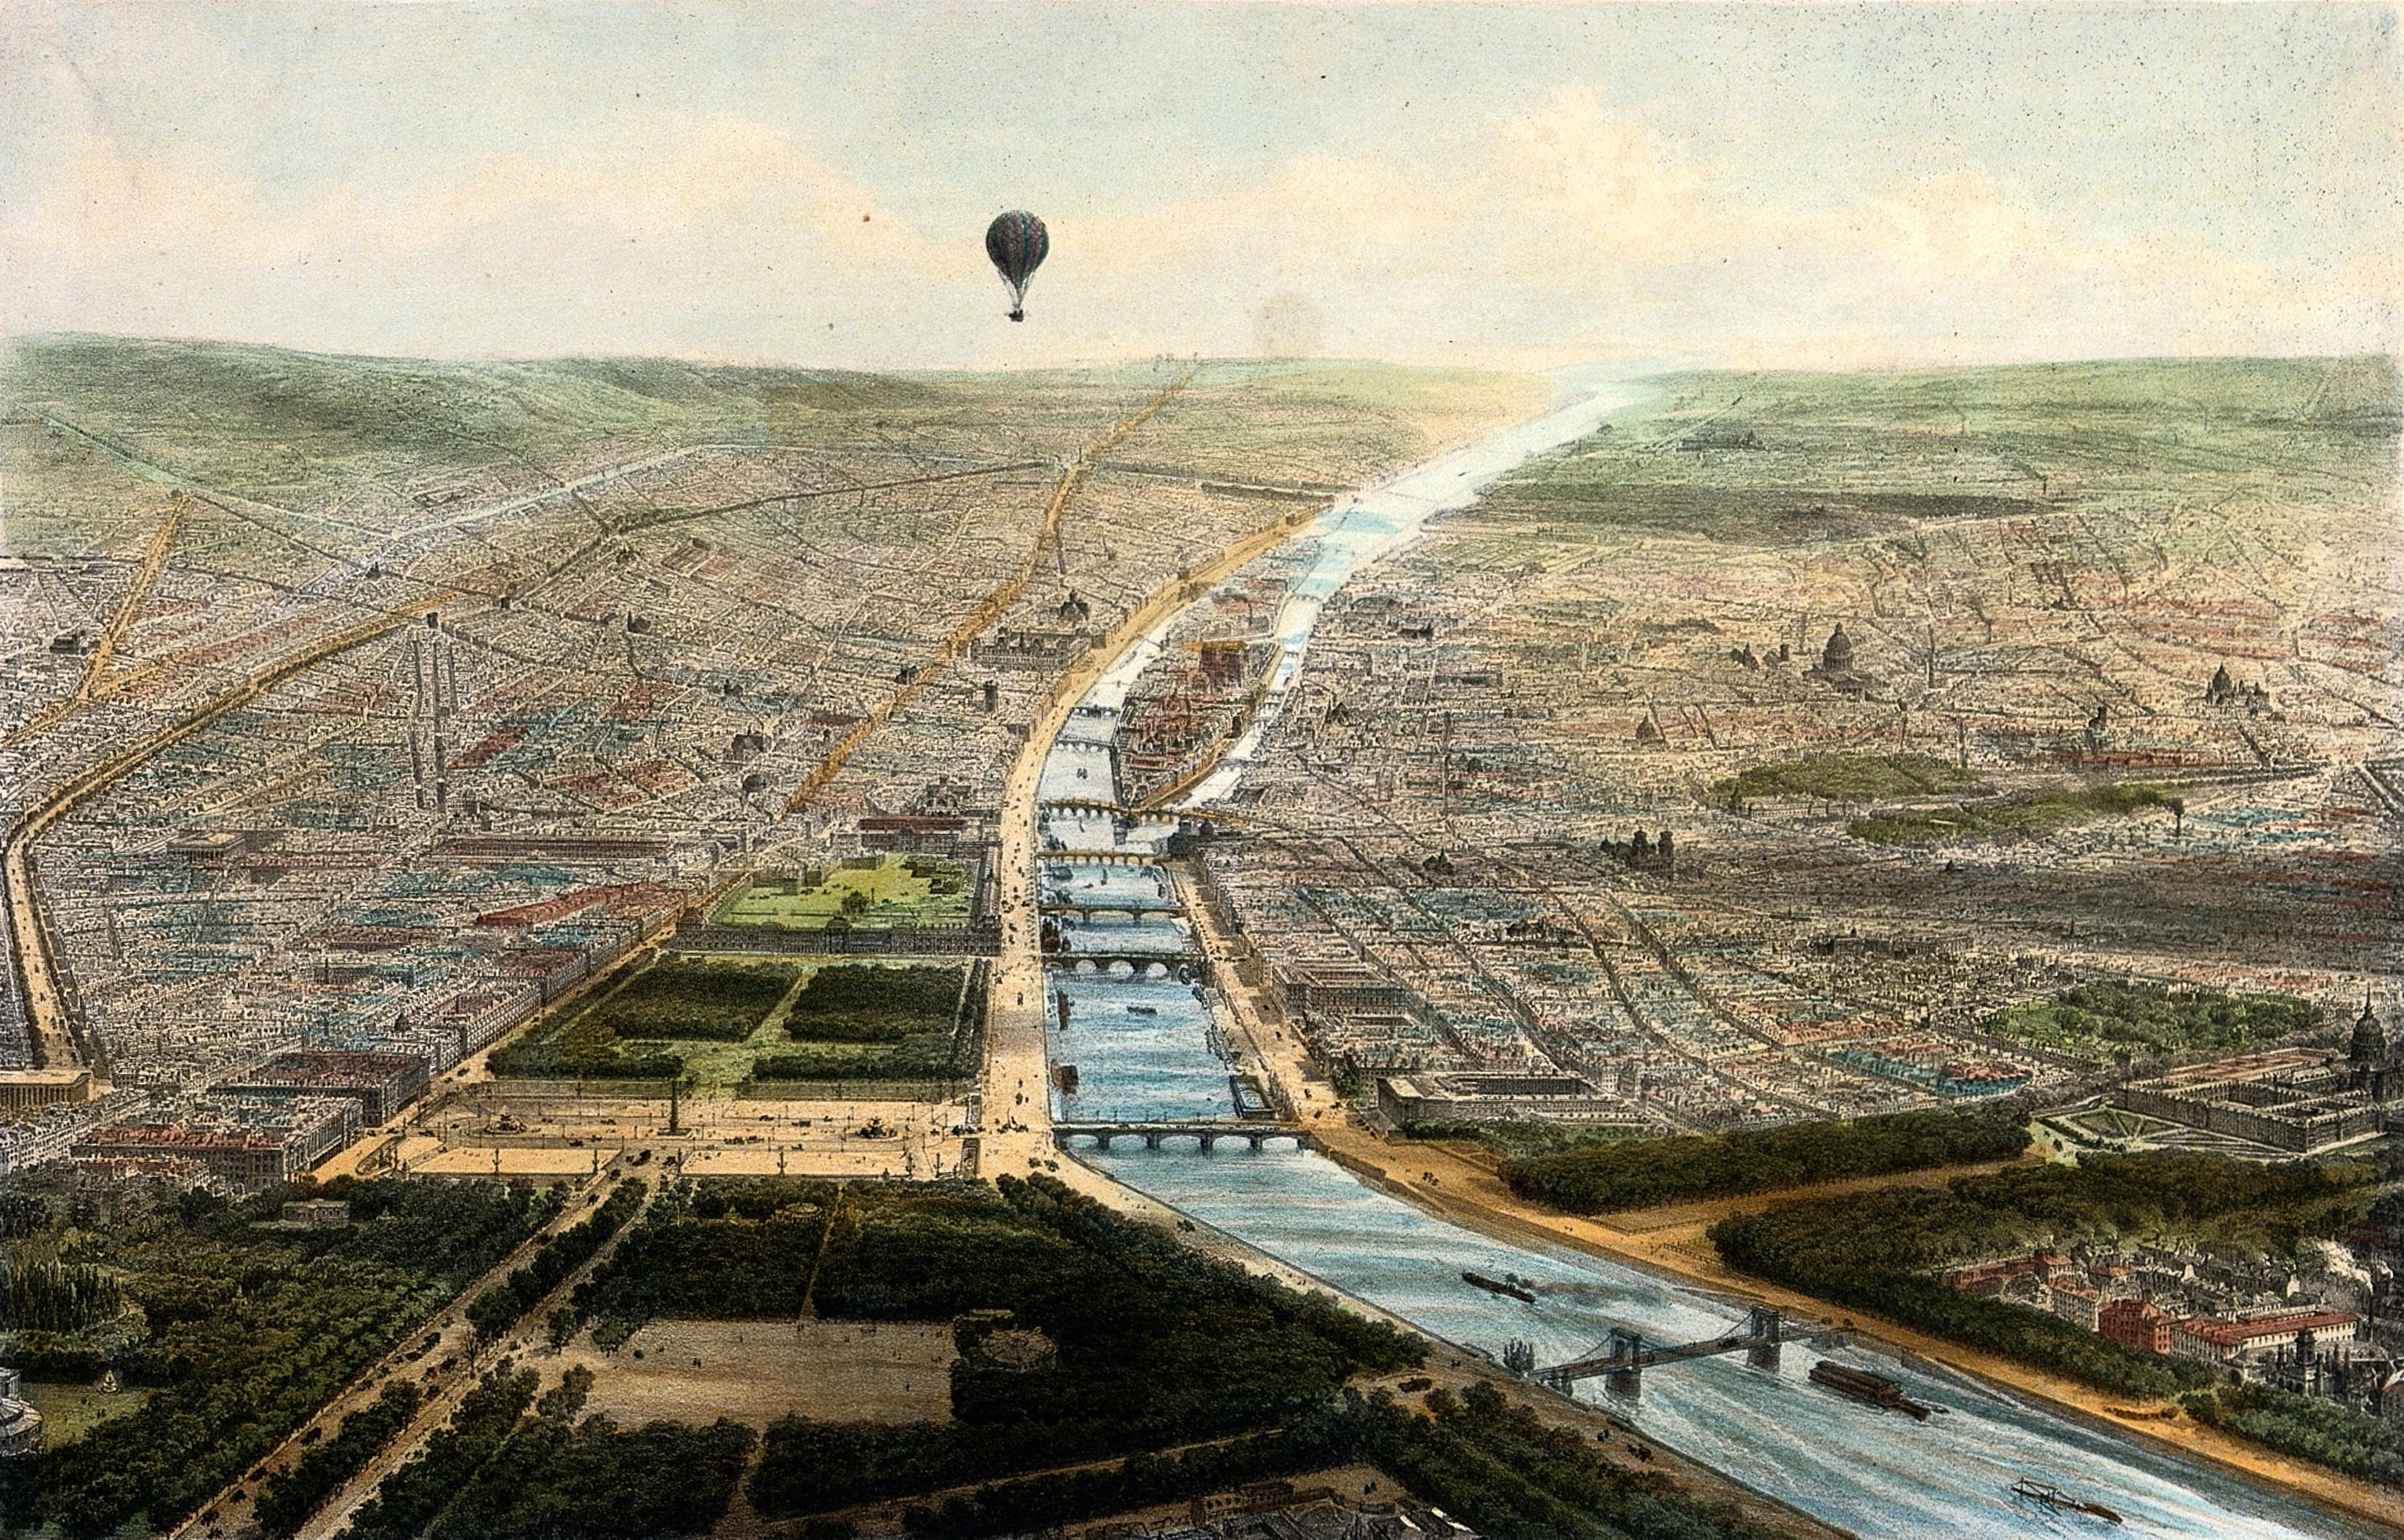 File:A hot-air balloon travels over part of Paris giving an aeria ...